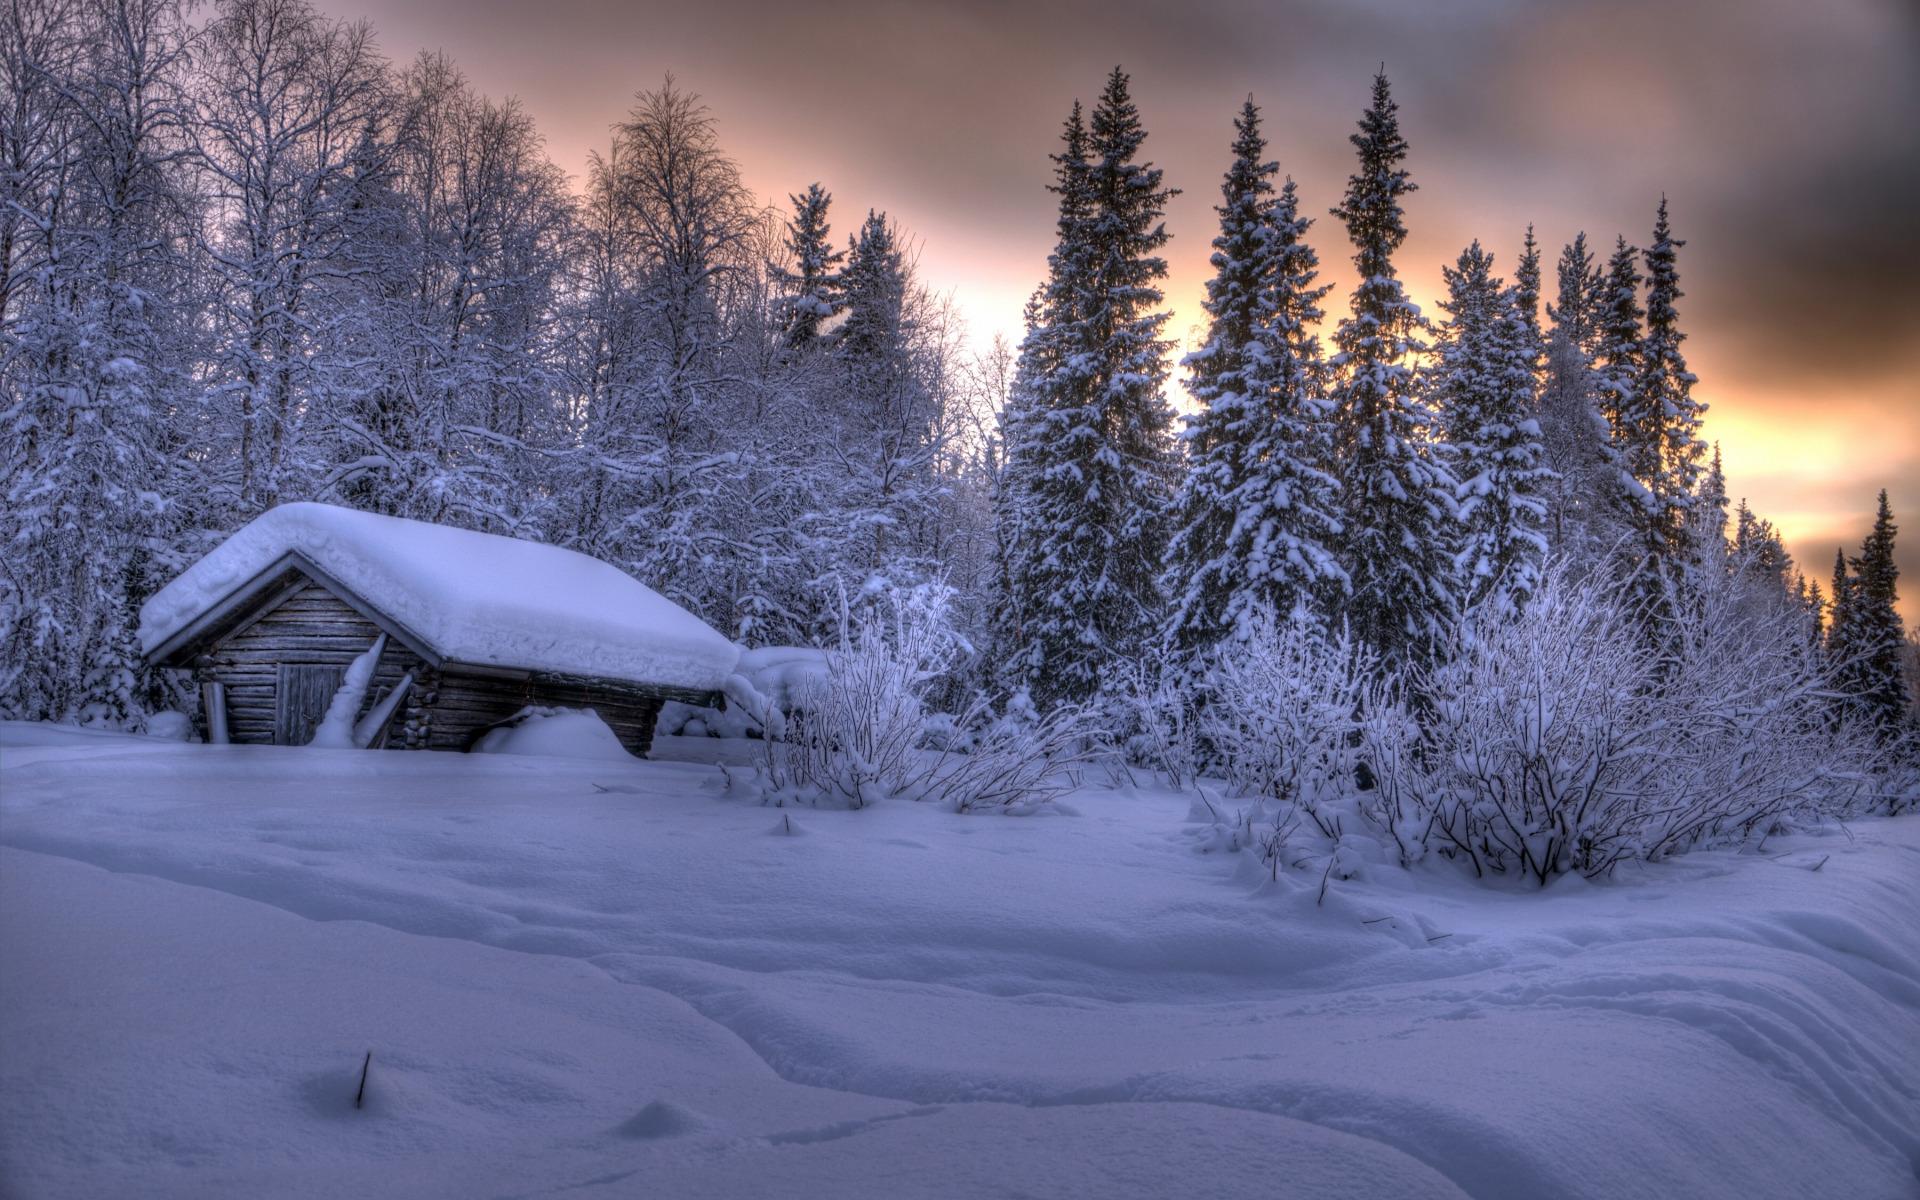 избушка в лесу картинки зима инквизиции было заставить